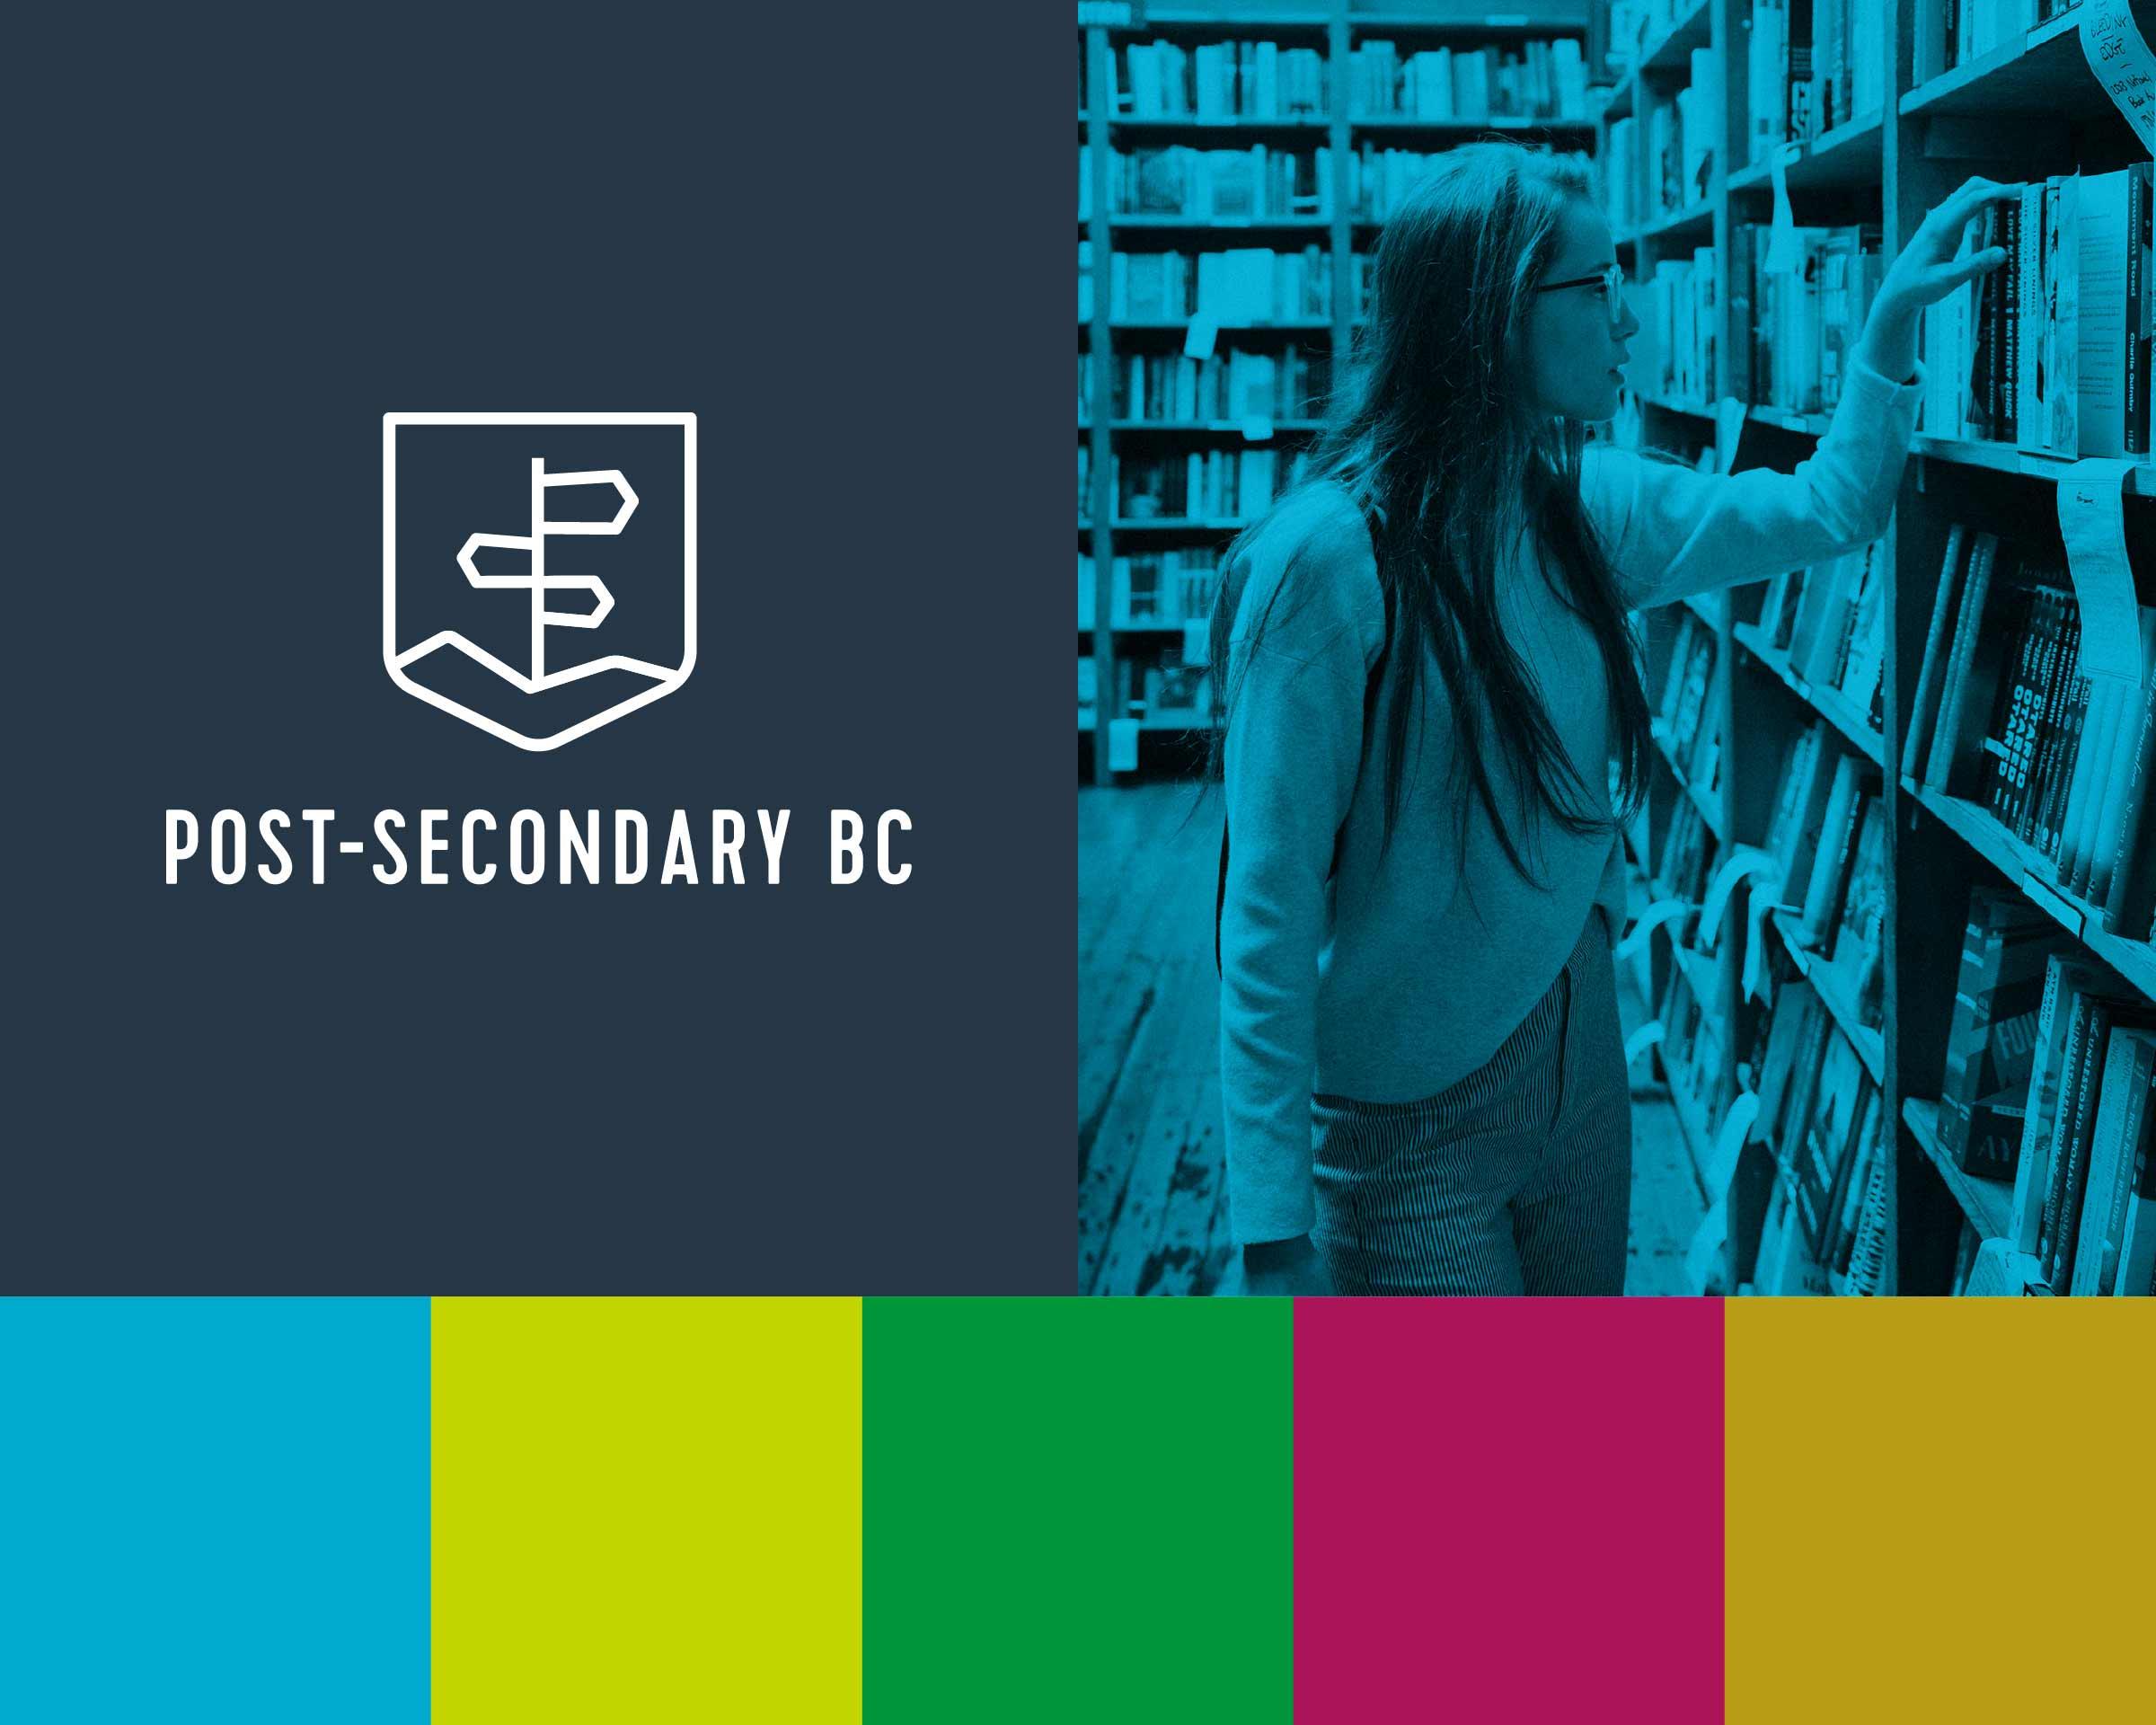 Post-Secondary BC Branding